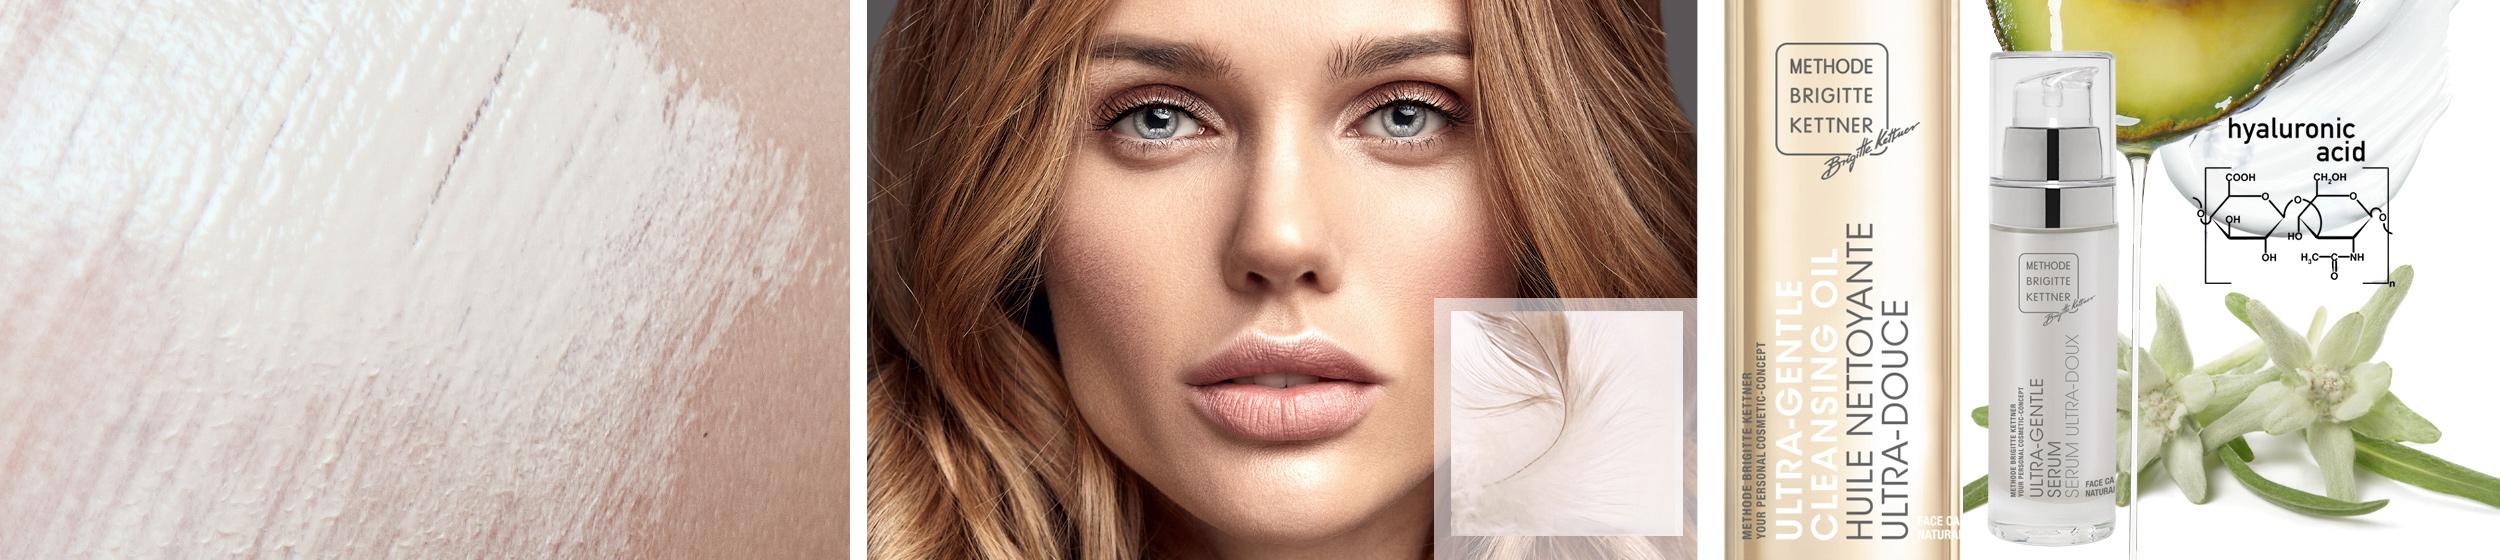 Hyper-sensitive skin prone to allergies